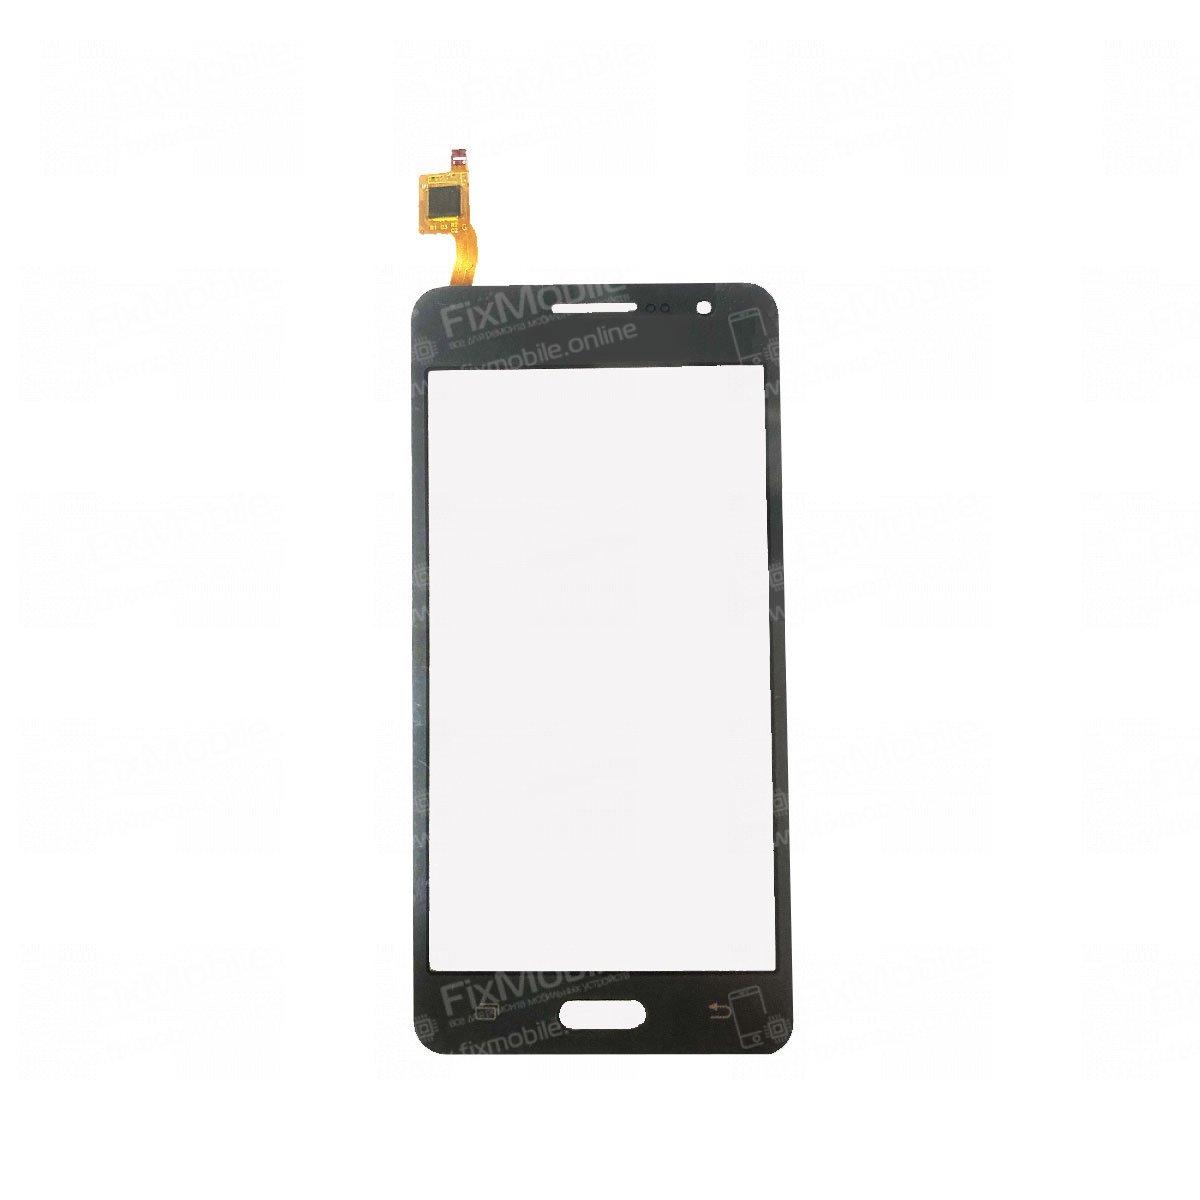 Тачскрин (сенсор) для Samsung Galaxy Grand Prime (G530H) (черный)